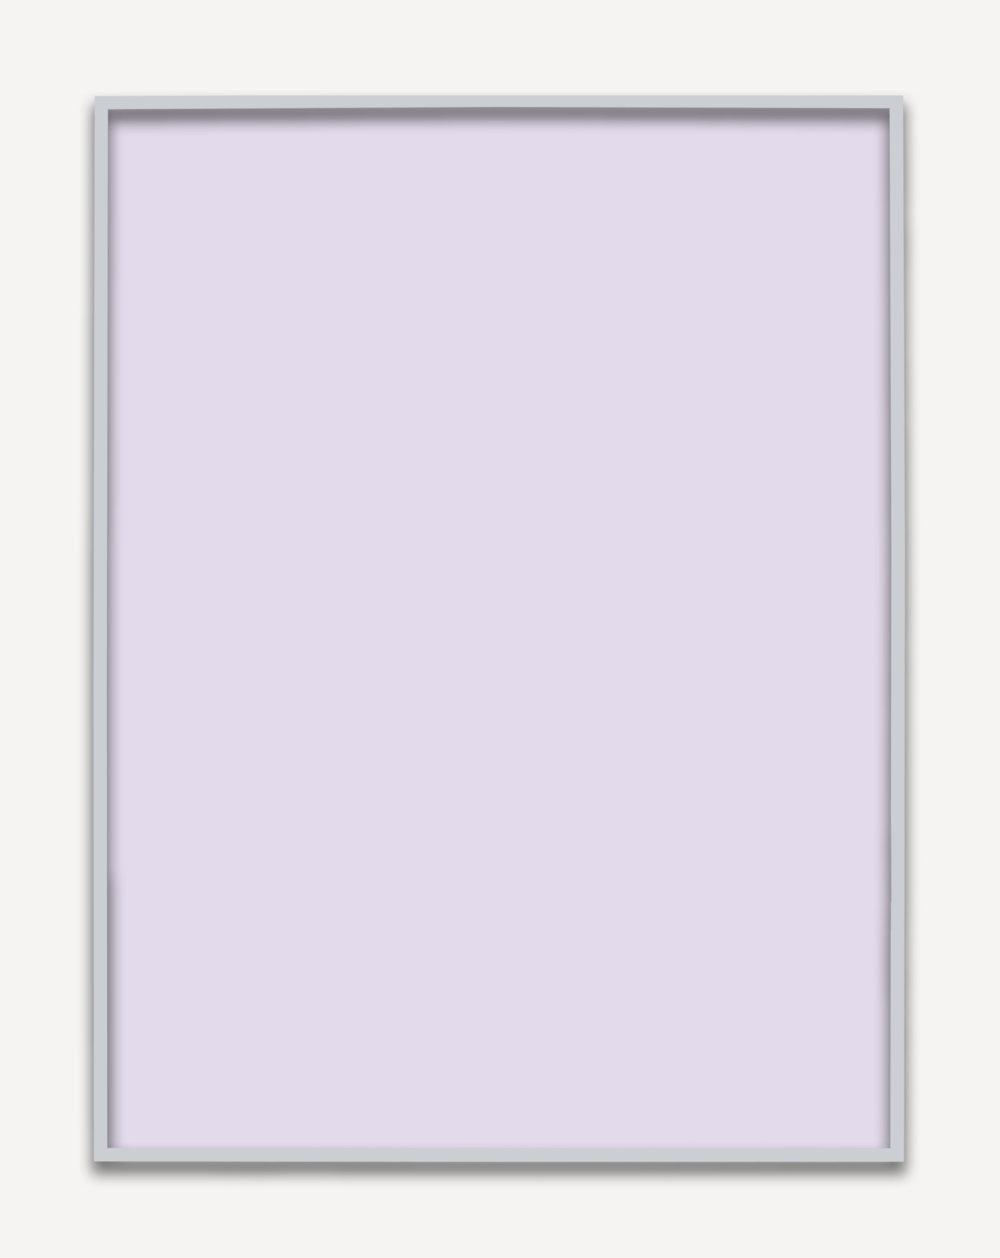 Untitled (Purple Monochrome 05), 2015 unique chromogenic print 153,5 x 123,5 cm - 60 3/8 x 48 5/8 inches (framed)